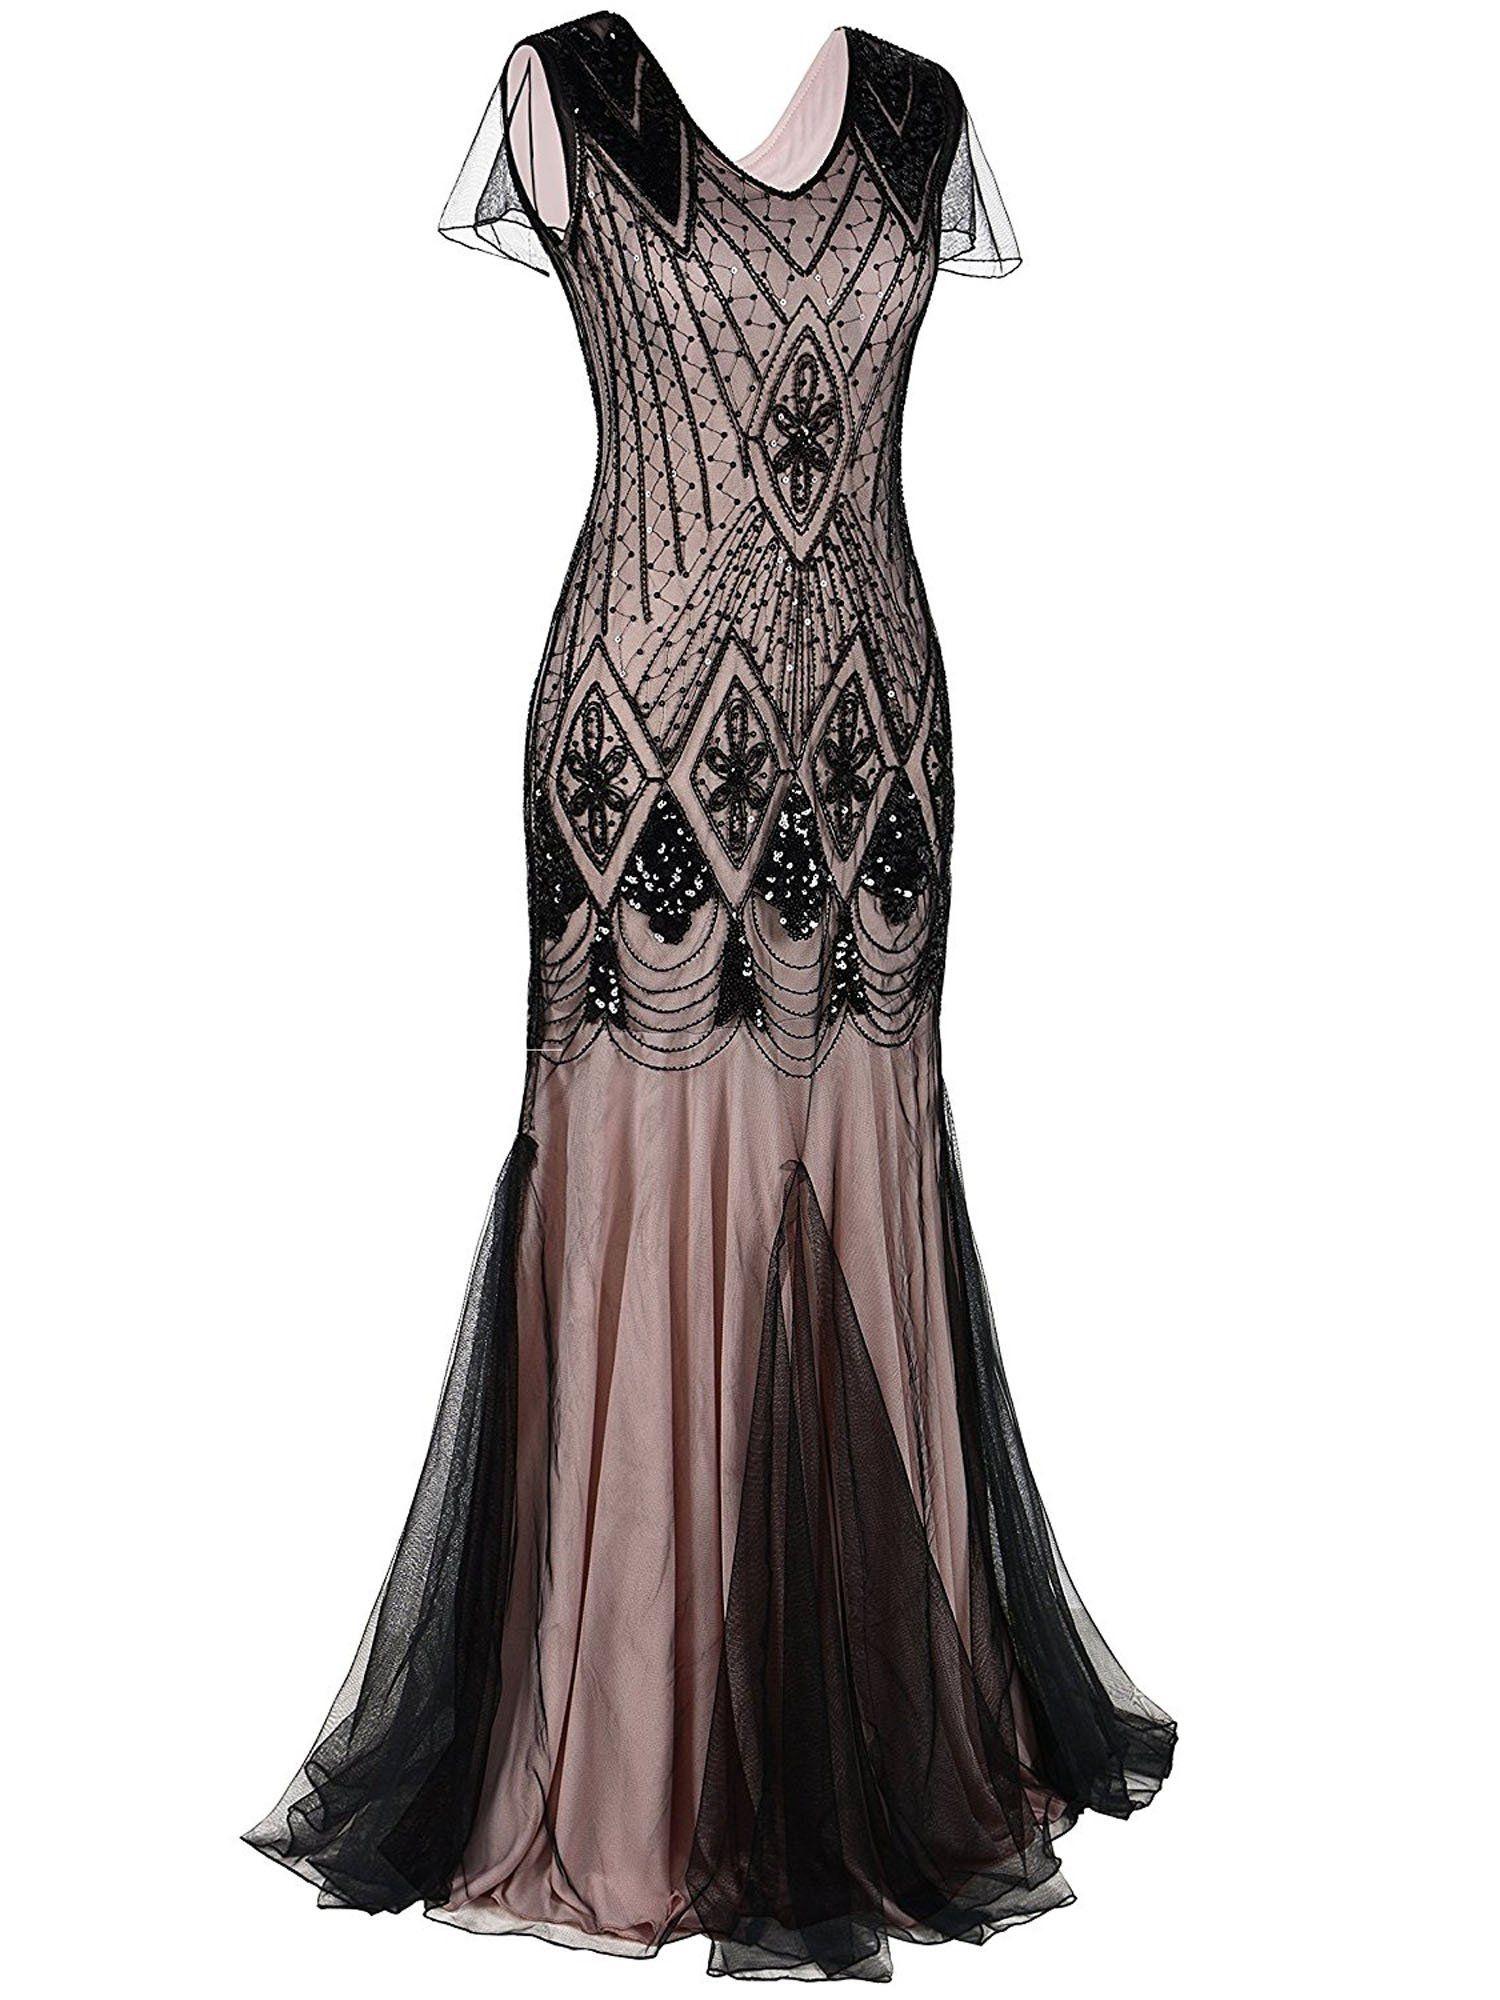 94fa87ed38ffe Pink 1920s Cap Sleeve Sequin Evening Dress | Online stores | Sequin ...